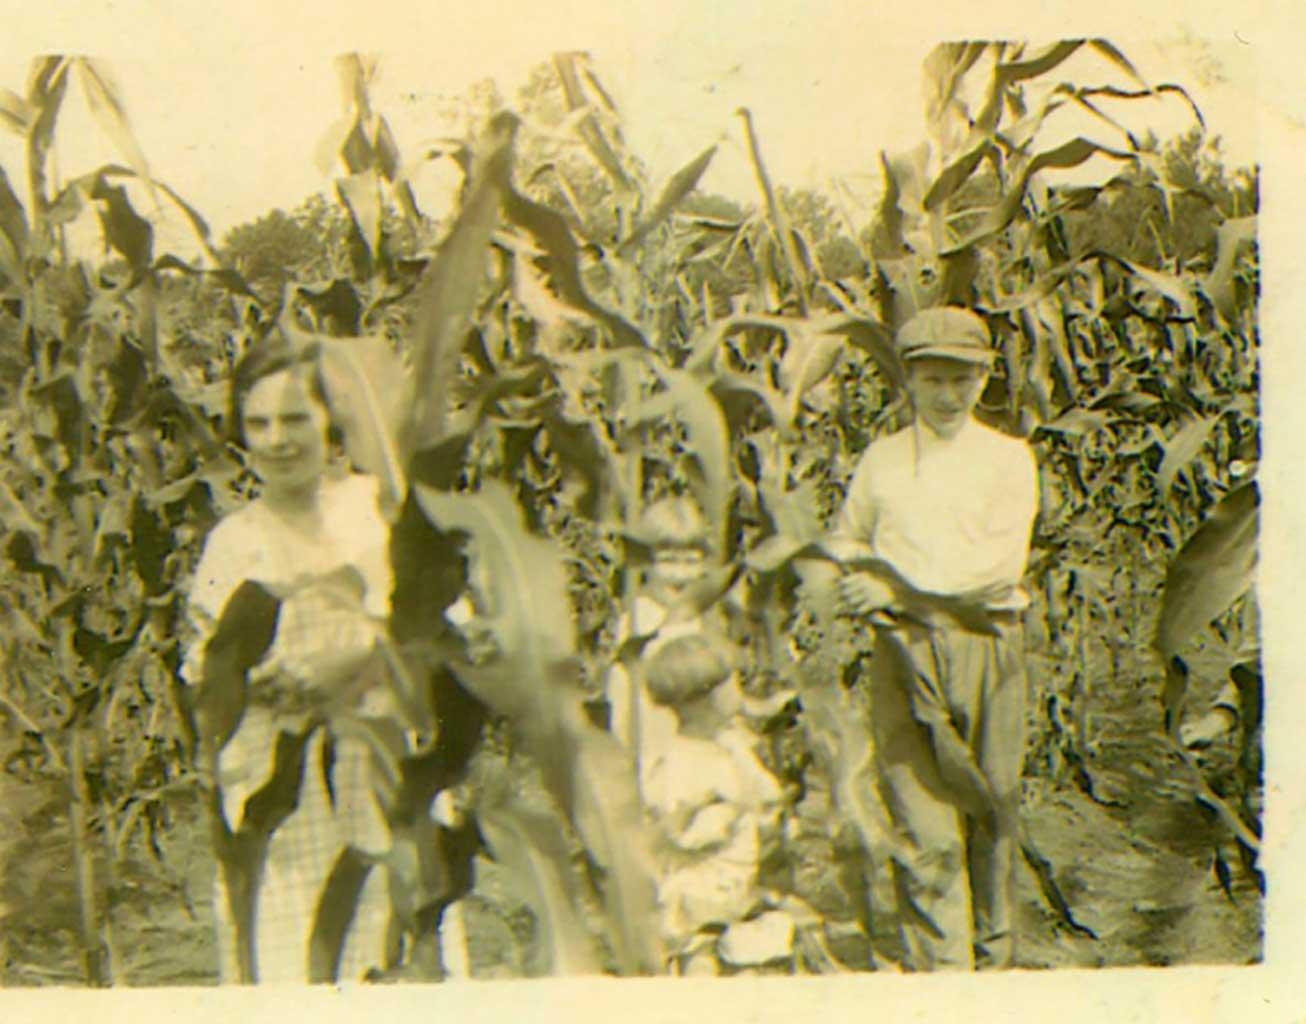 4-family-members-in-corn-field-1919-img019